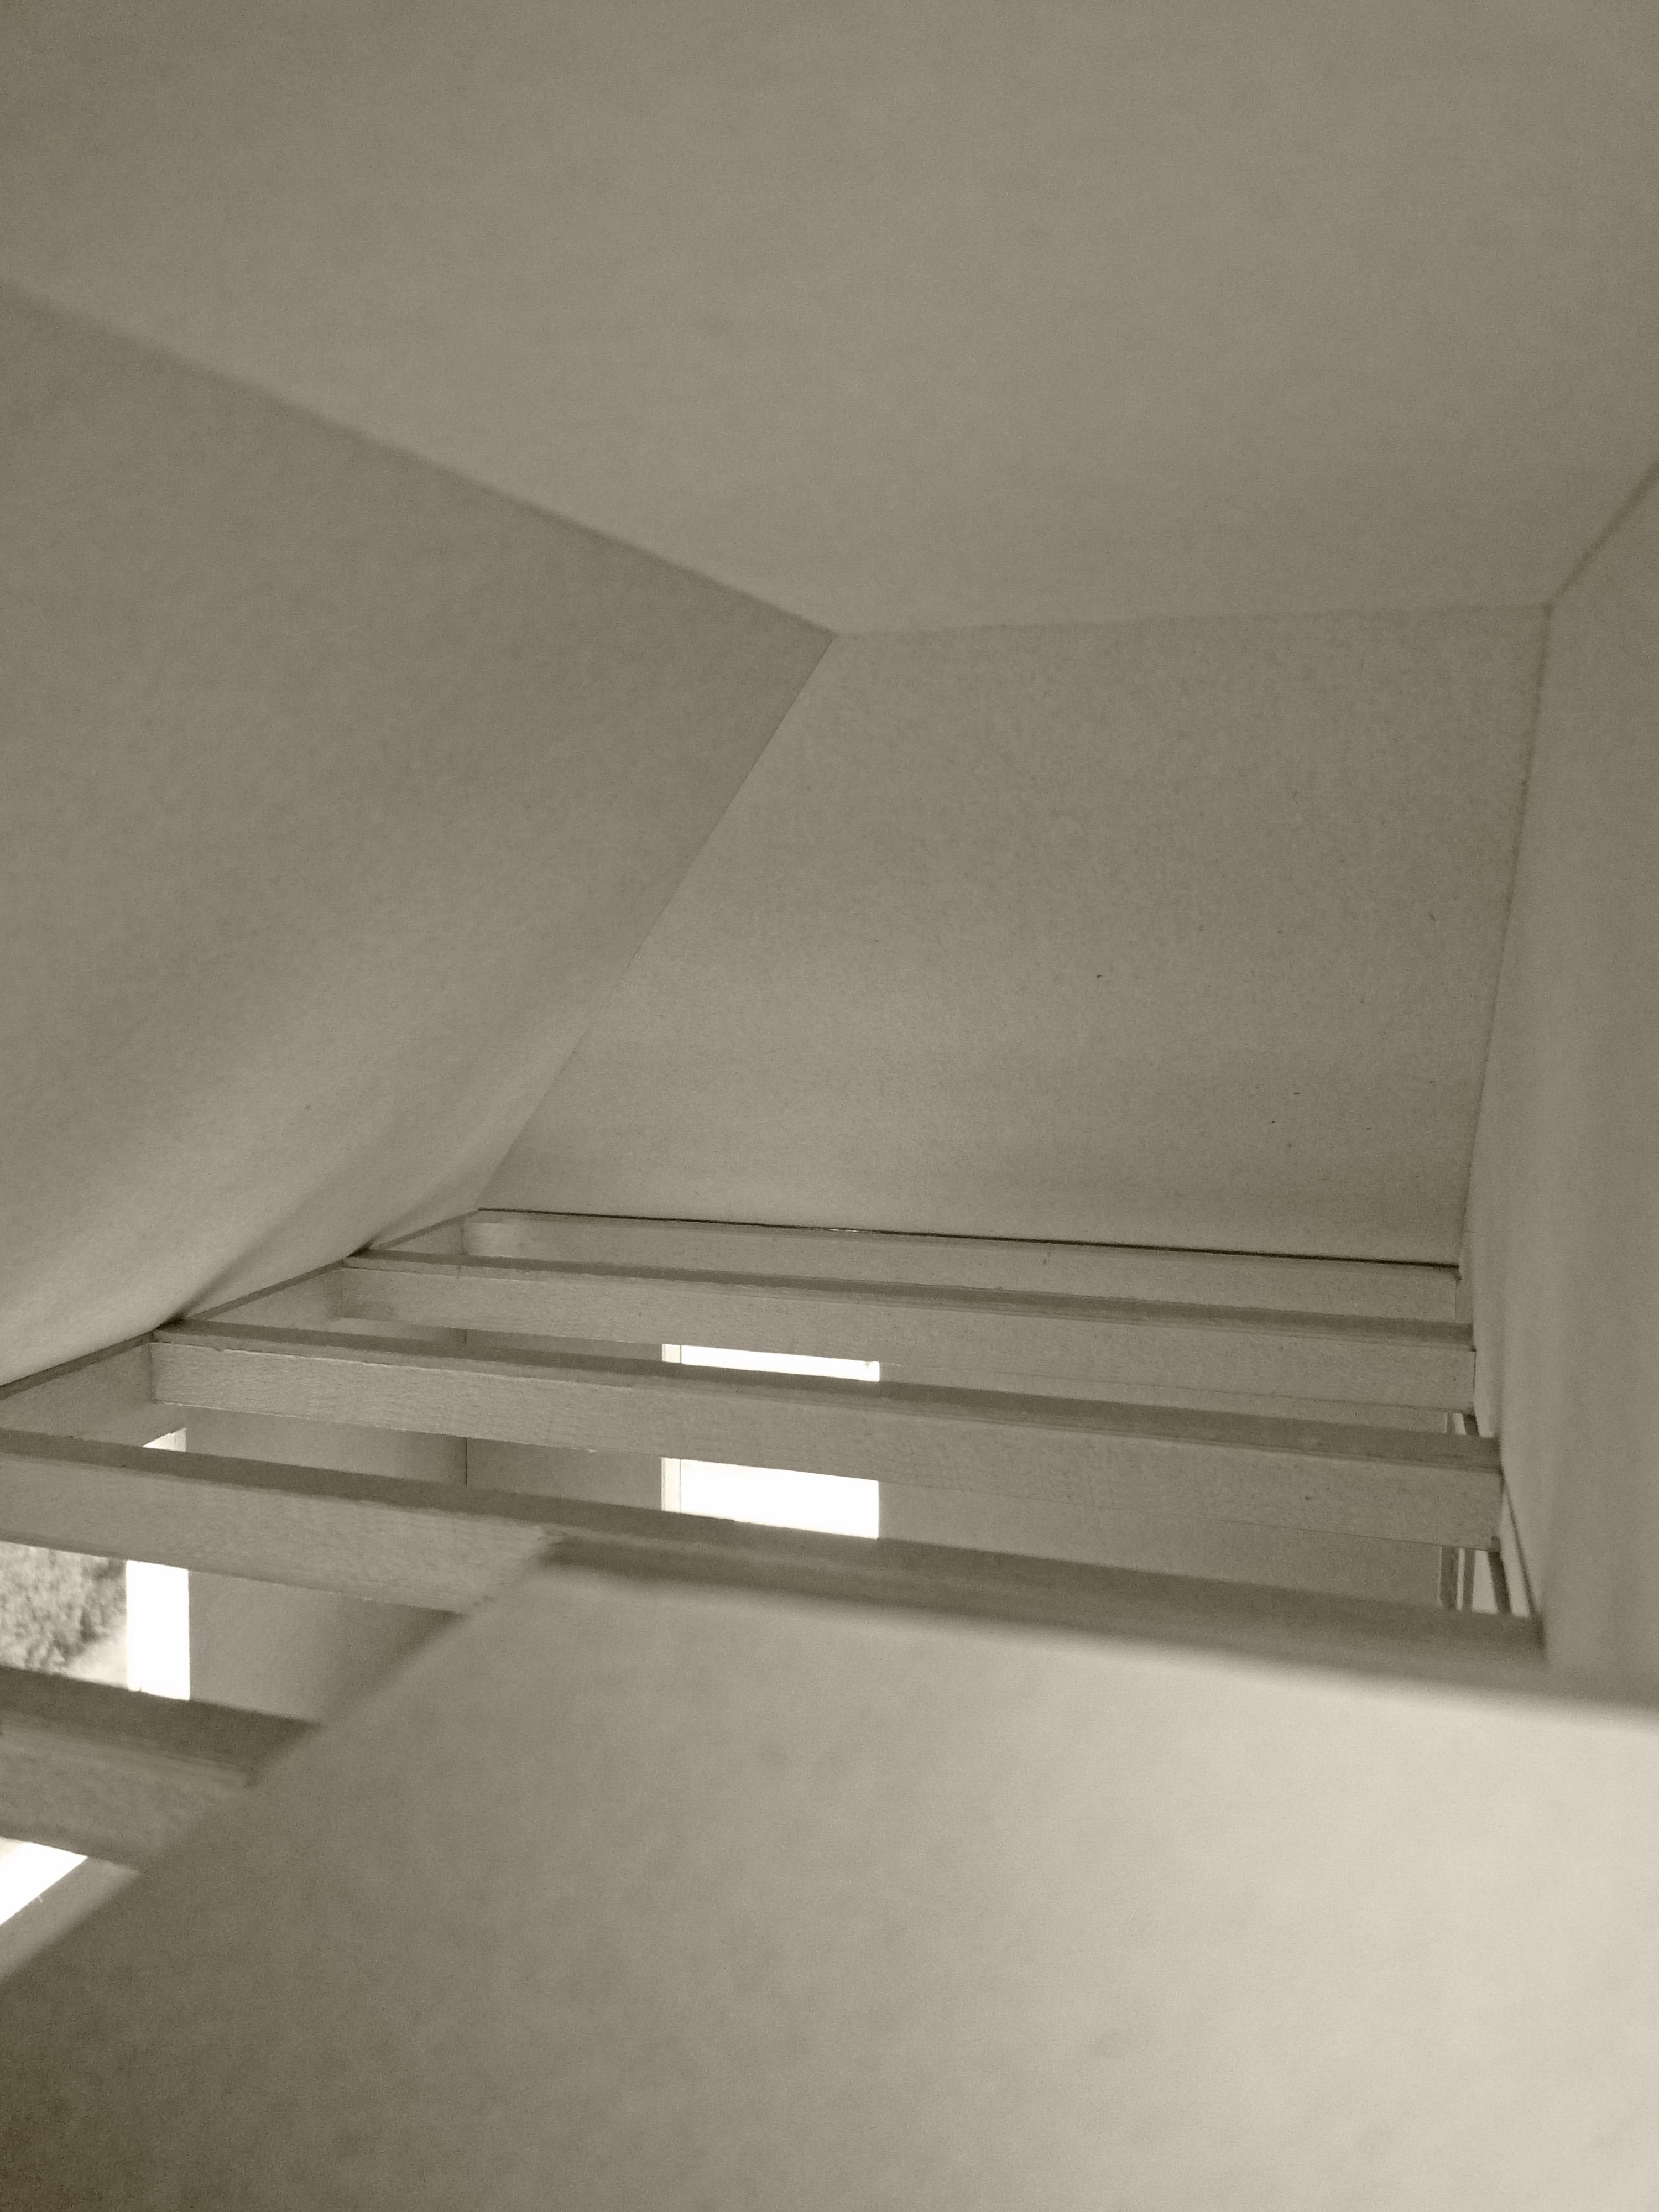 Modellfoto Luftraum ü. Büro (1.Projekt)